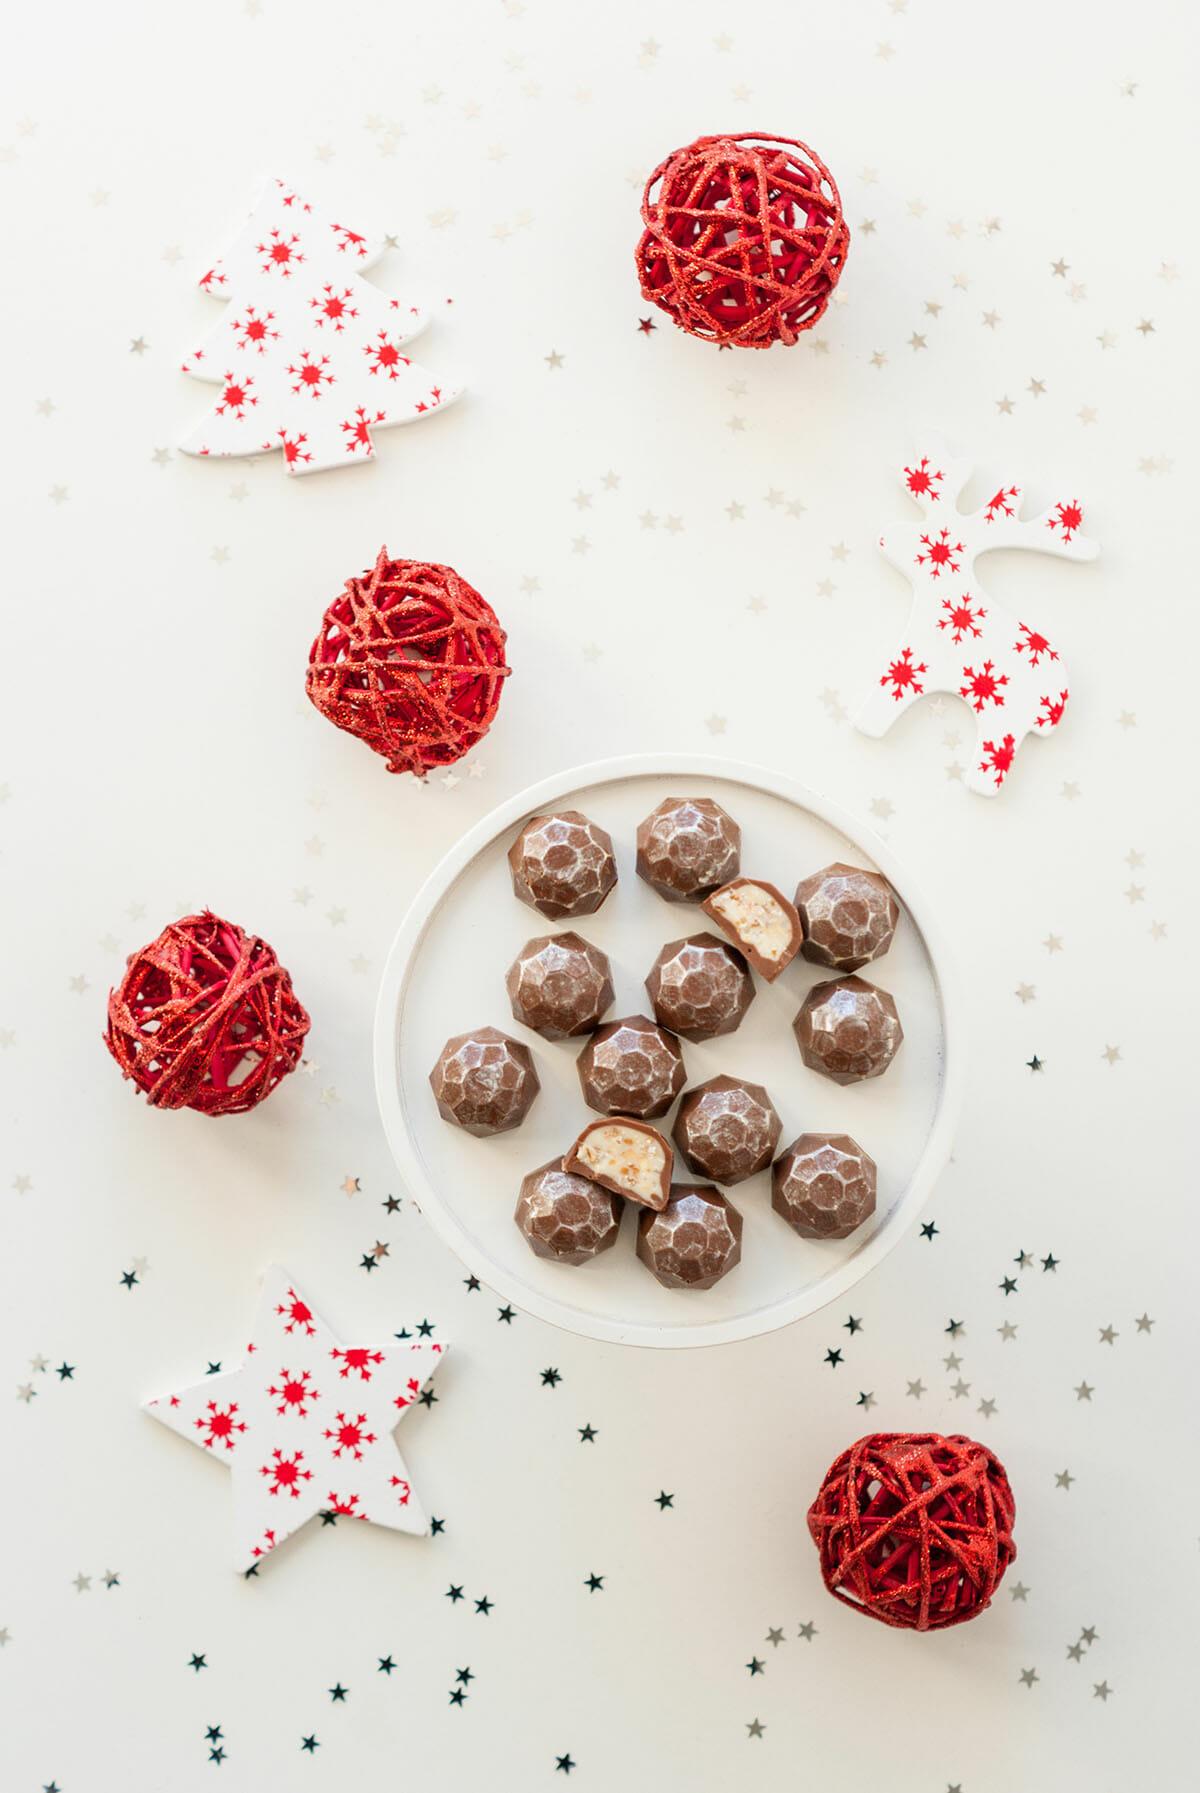 Lilie Bakery | Chocolats Façon Kinder® Schoko-bons { DIY Noël } 2